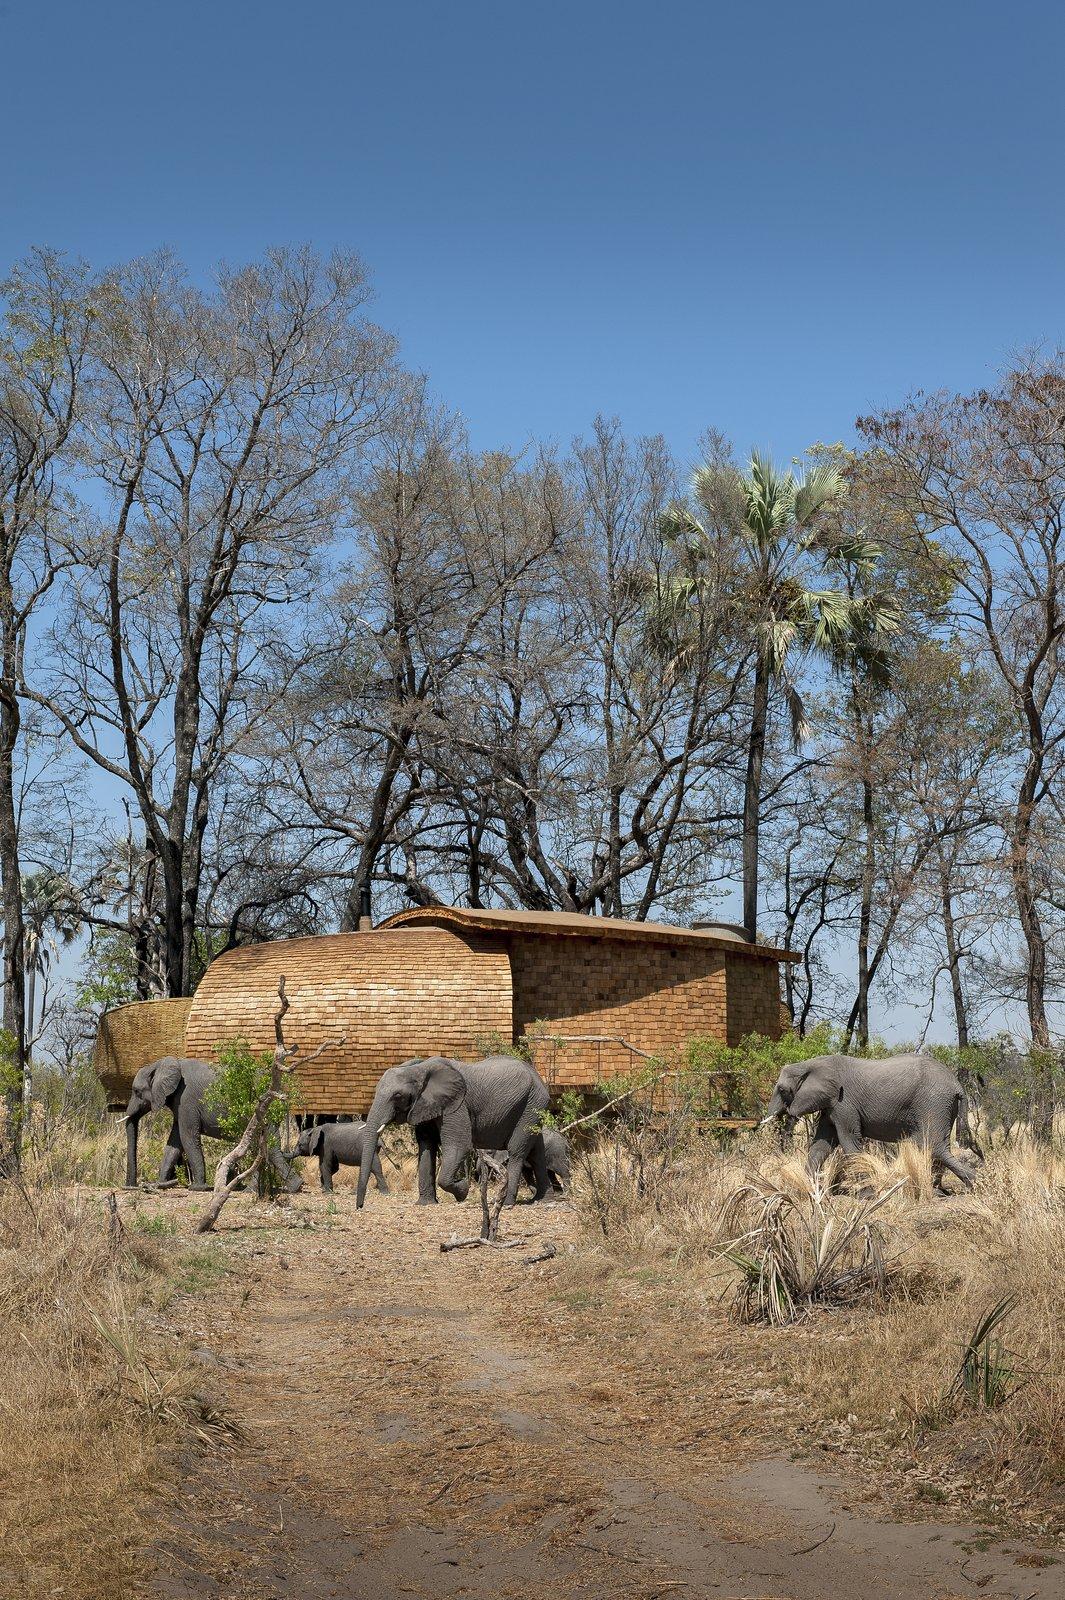 Photo 2 of 13 in Eco-Friendly Safari Lodge in Africa's Okavango Delta